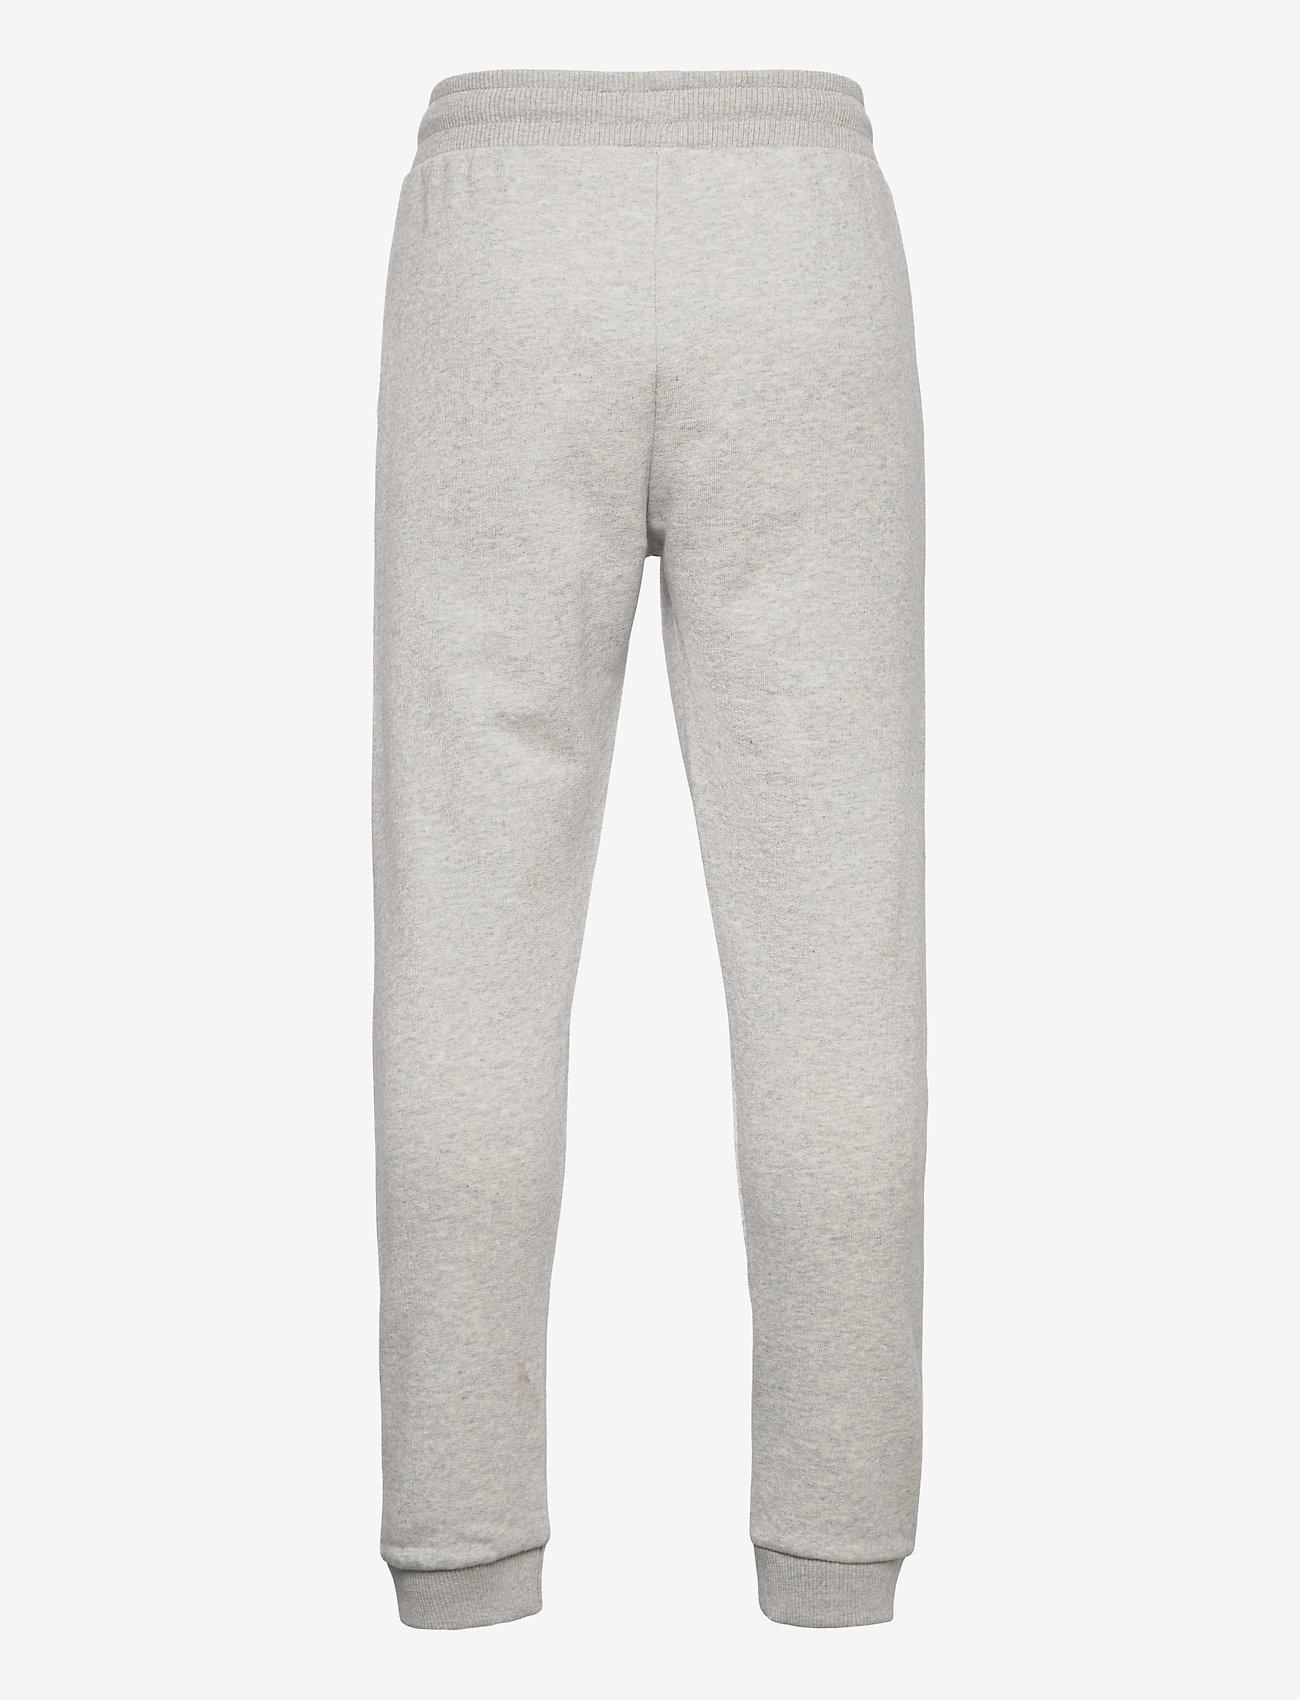 Mini A Ture - Even pants, K - sweatpants - light grey melange - 1